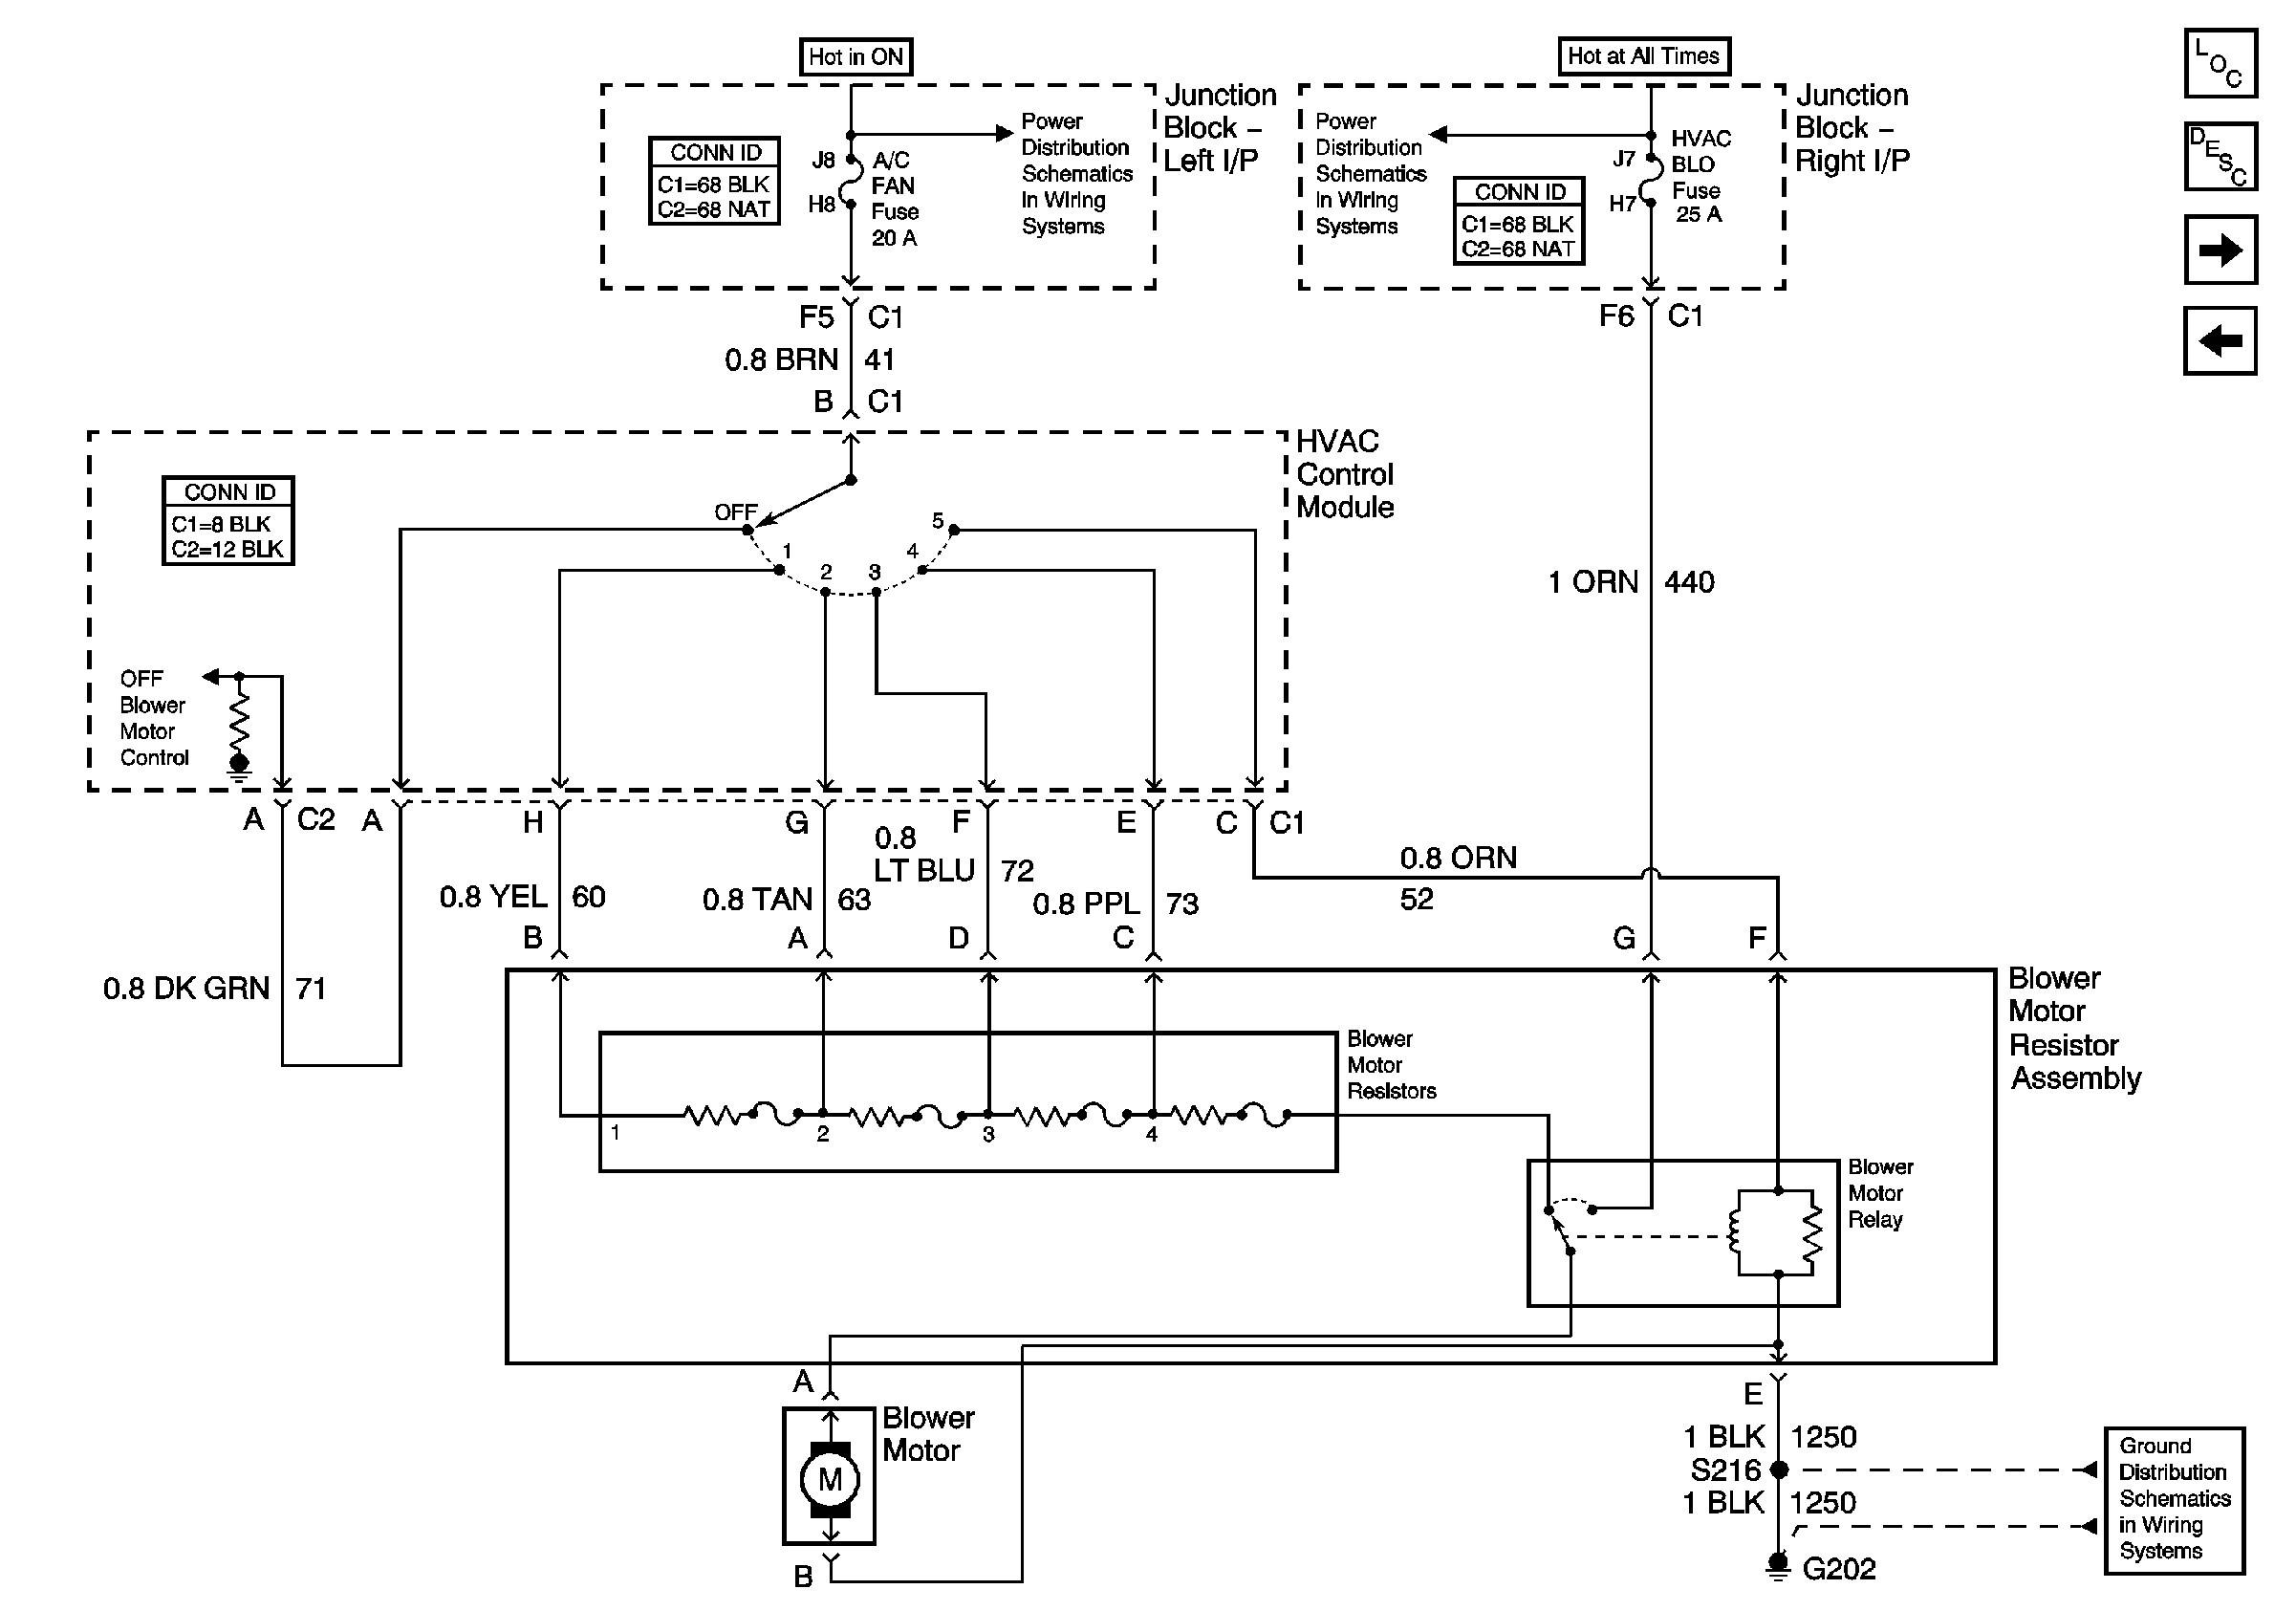 2005 Chevrolet Silverado Blower Motor Wiring Diagram | Wiring Library - 2005 Chevy Silverado Blower Motor Resistor Wiring Diagram